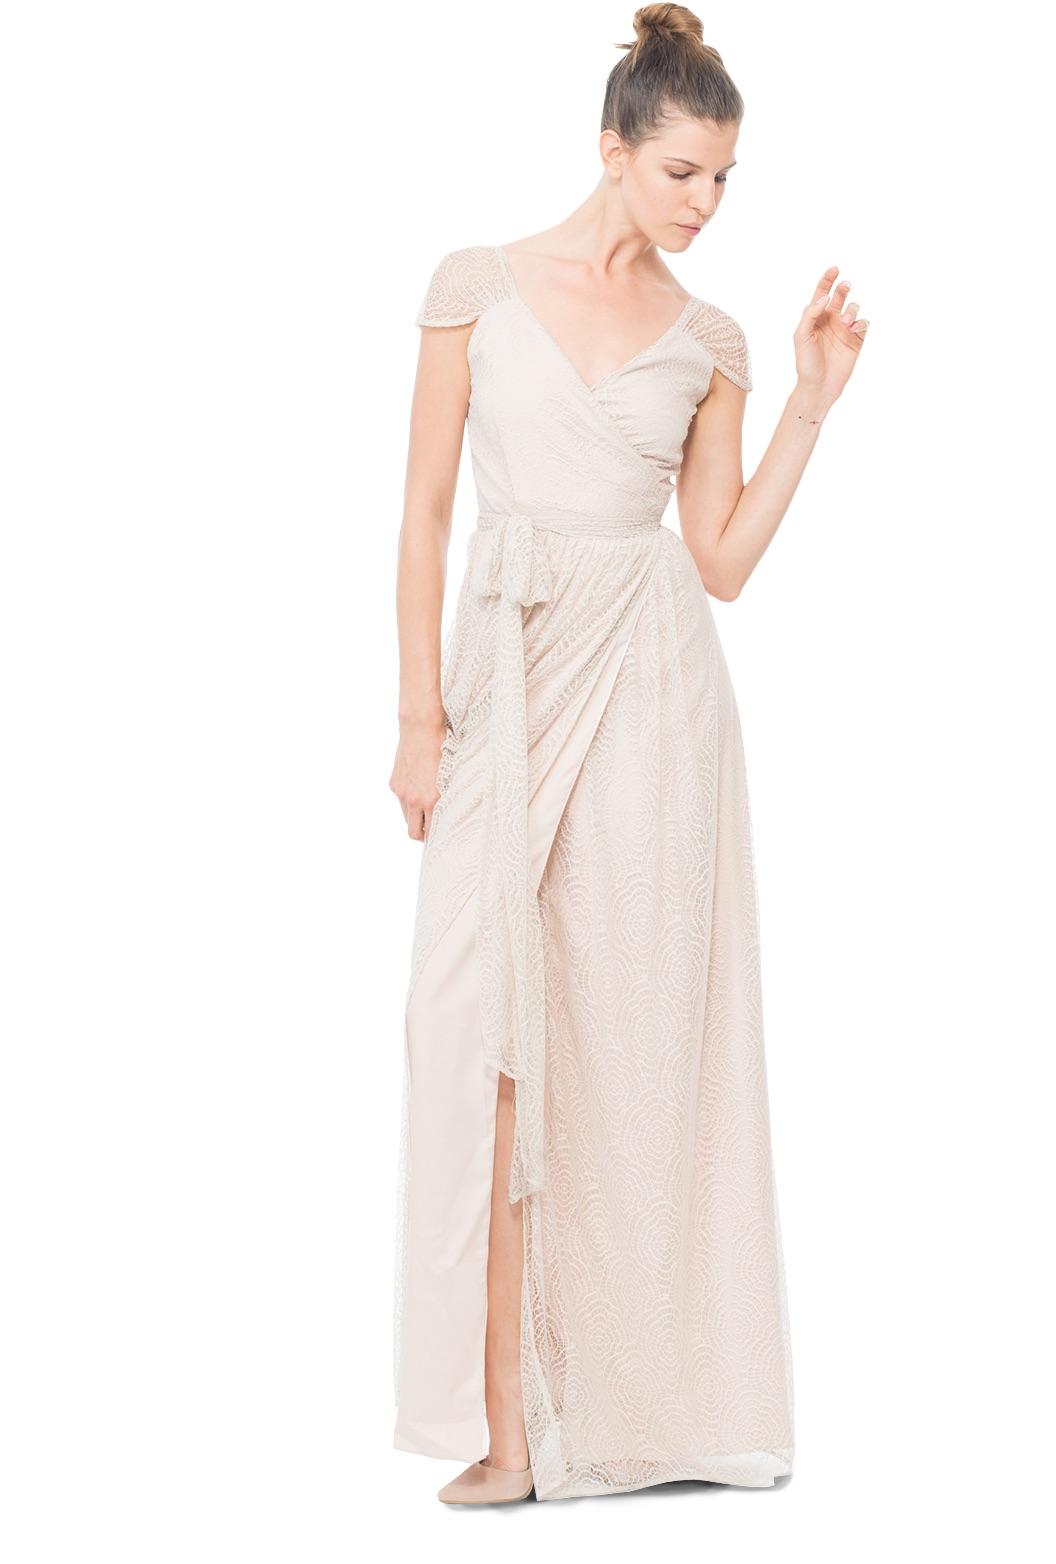 ivory-and-beau-bridal-boutique-savannah-wedding-dress-savannah-wedding-gown-savannah-bridal-boutique-savannah-bridal-shop-savannah-wedding-planner-rodan-and-fields-joanna-august-bridesmaids-newbury.jpg